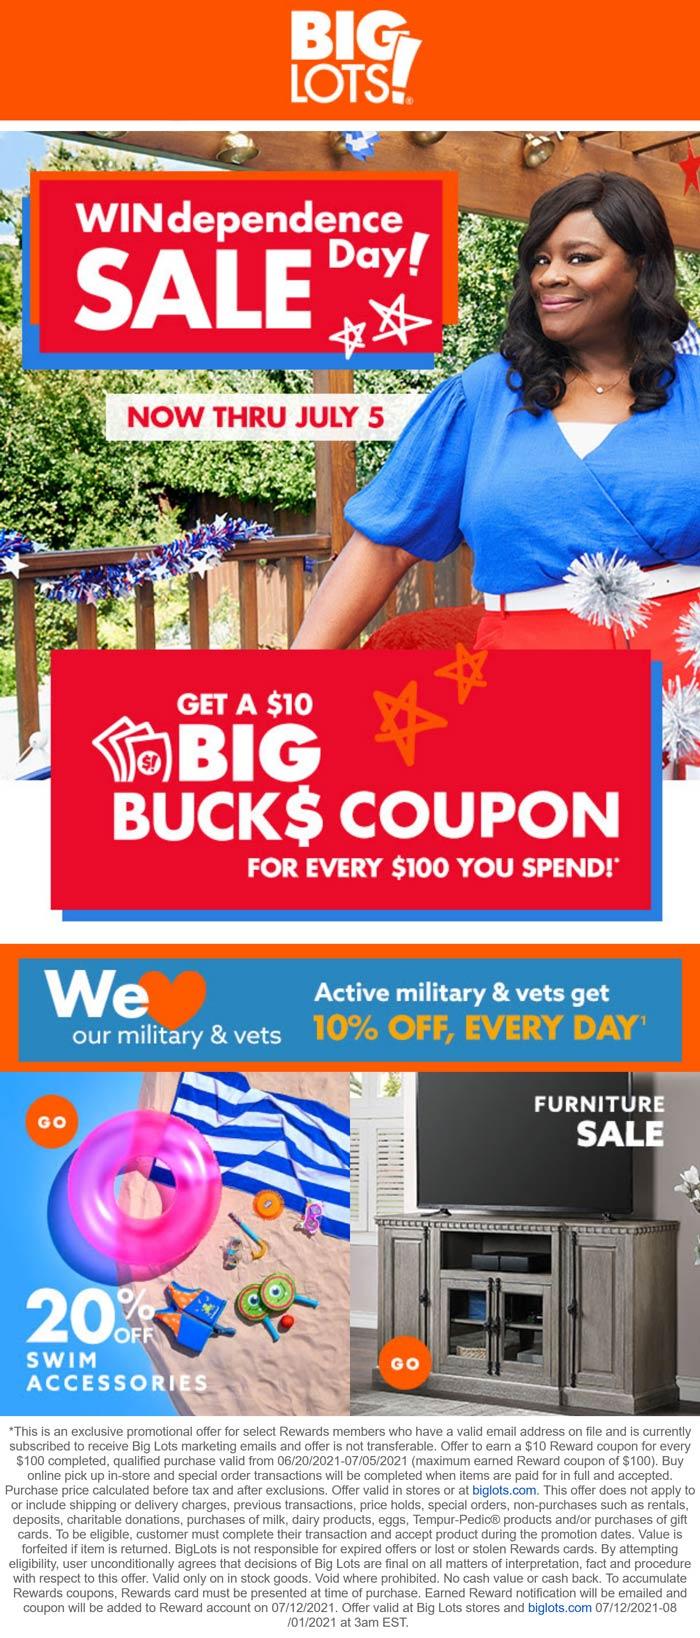 Big Lots stores Coupon  $10 store reward on every $100 spent at Big Lots #biglots